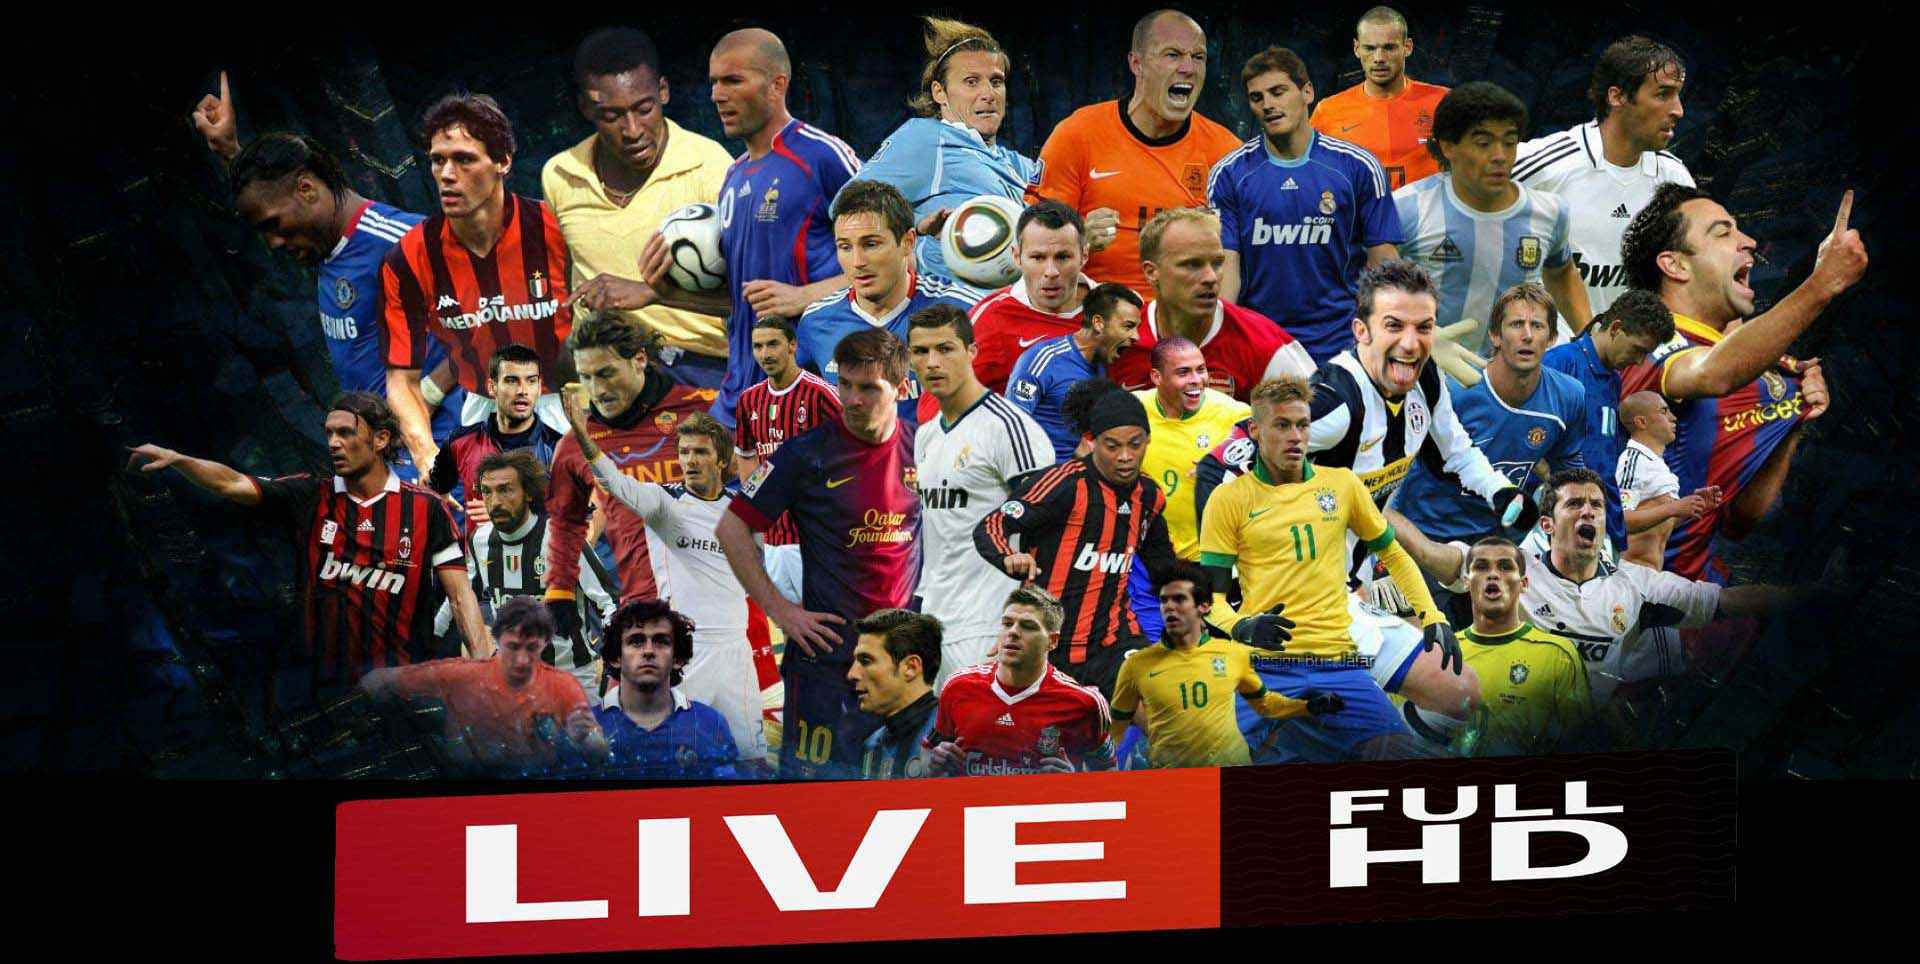 sporting-cp-vs-real-madrid-uefa-streaming-live